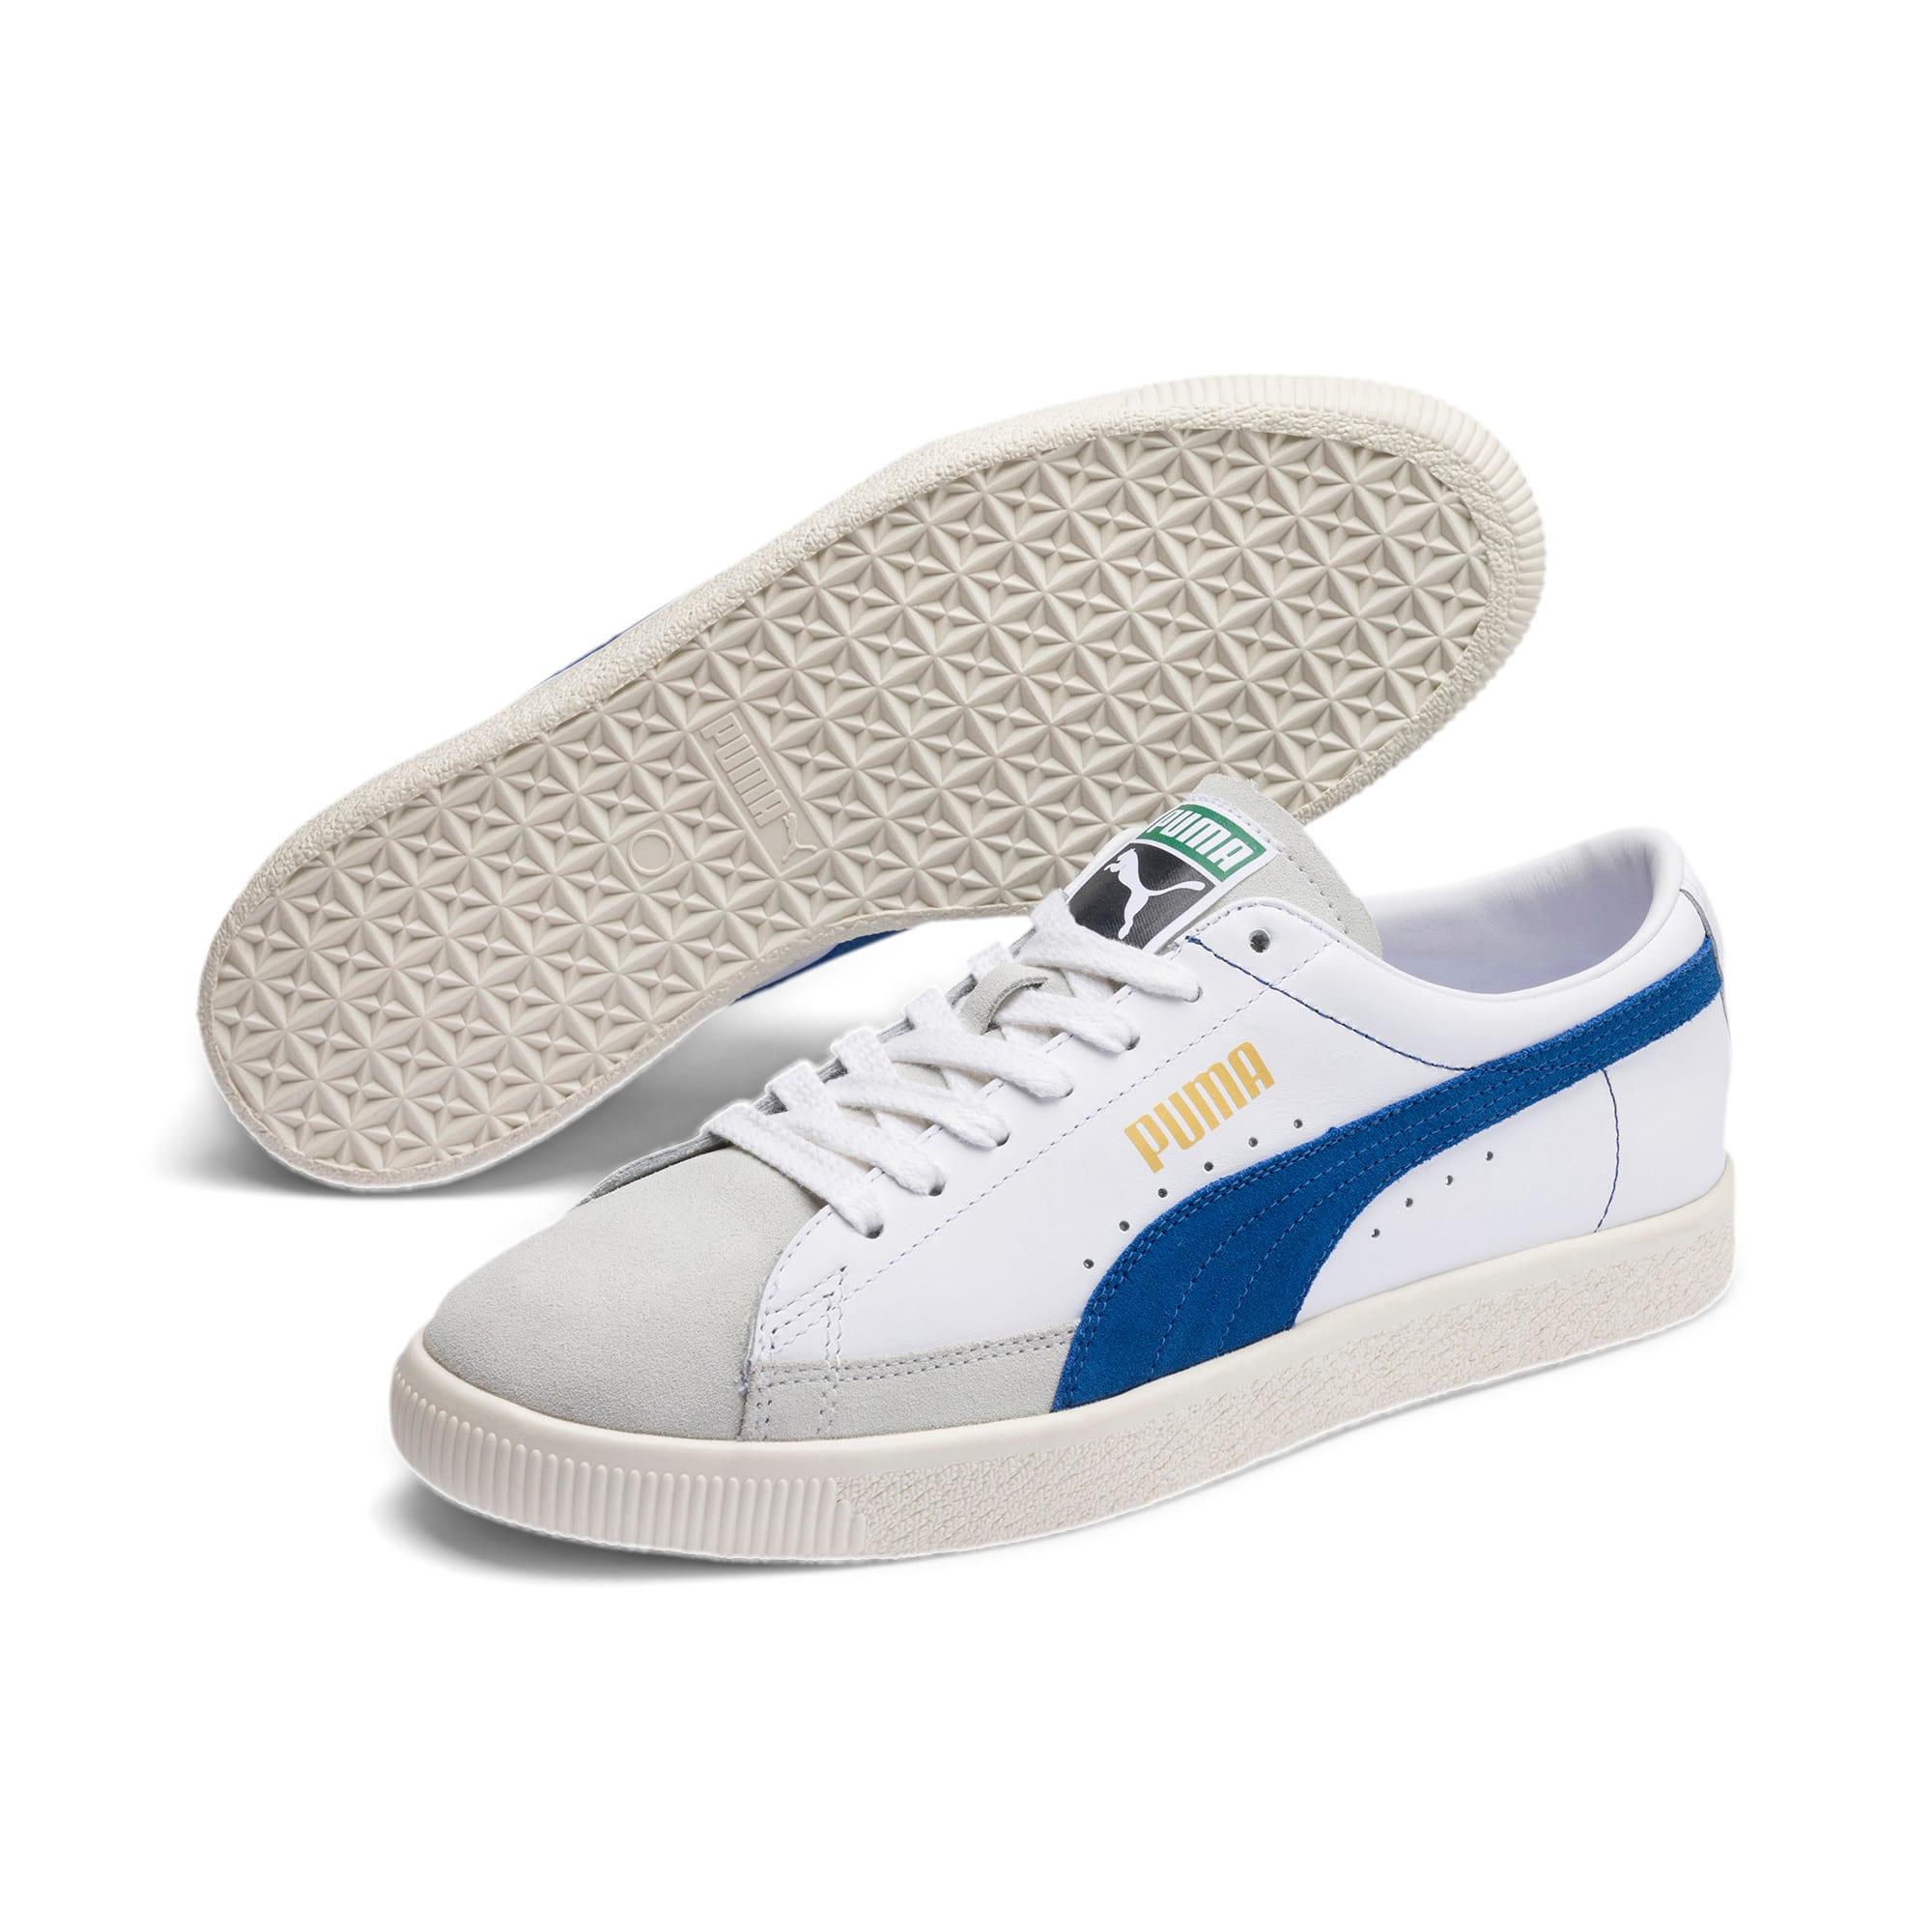 Miniatura 2 de Zapatos deportivosBasket 90680, Puma White-Galaxy Blue-Whisp, mediano